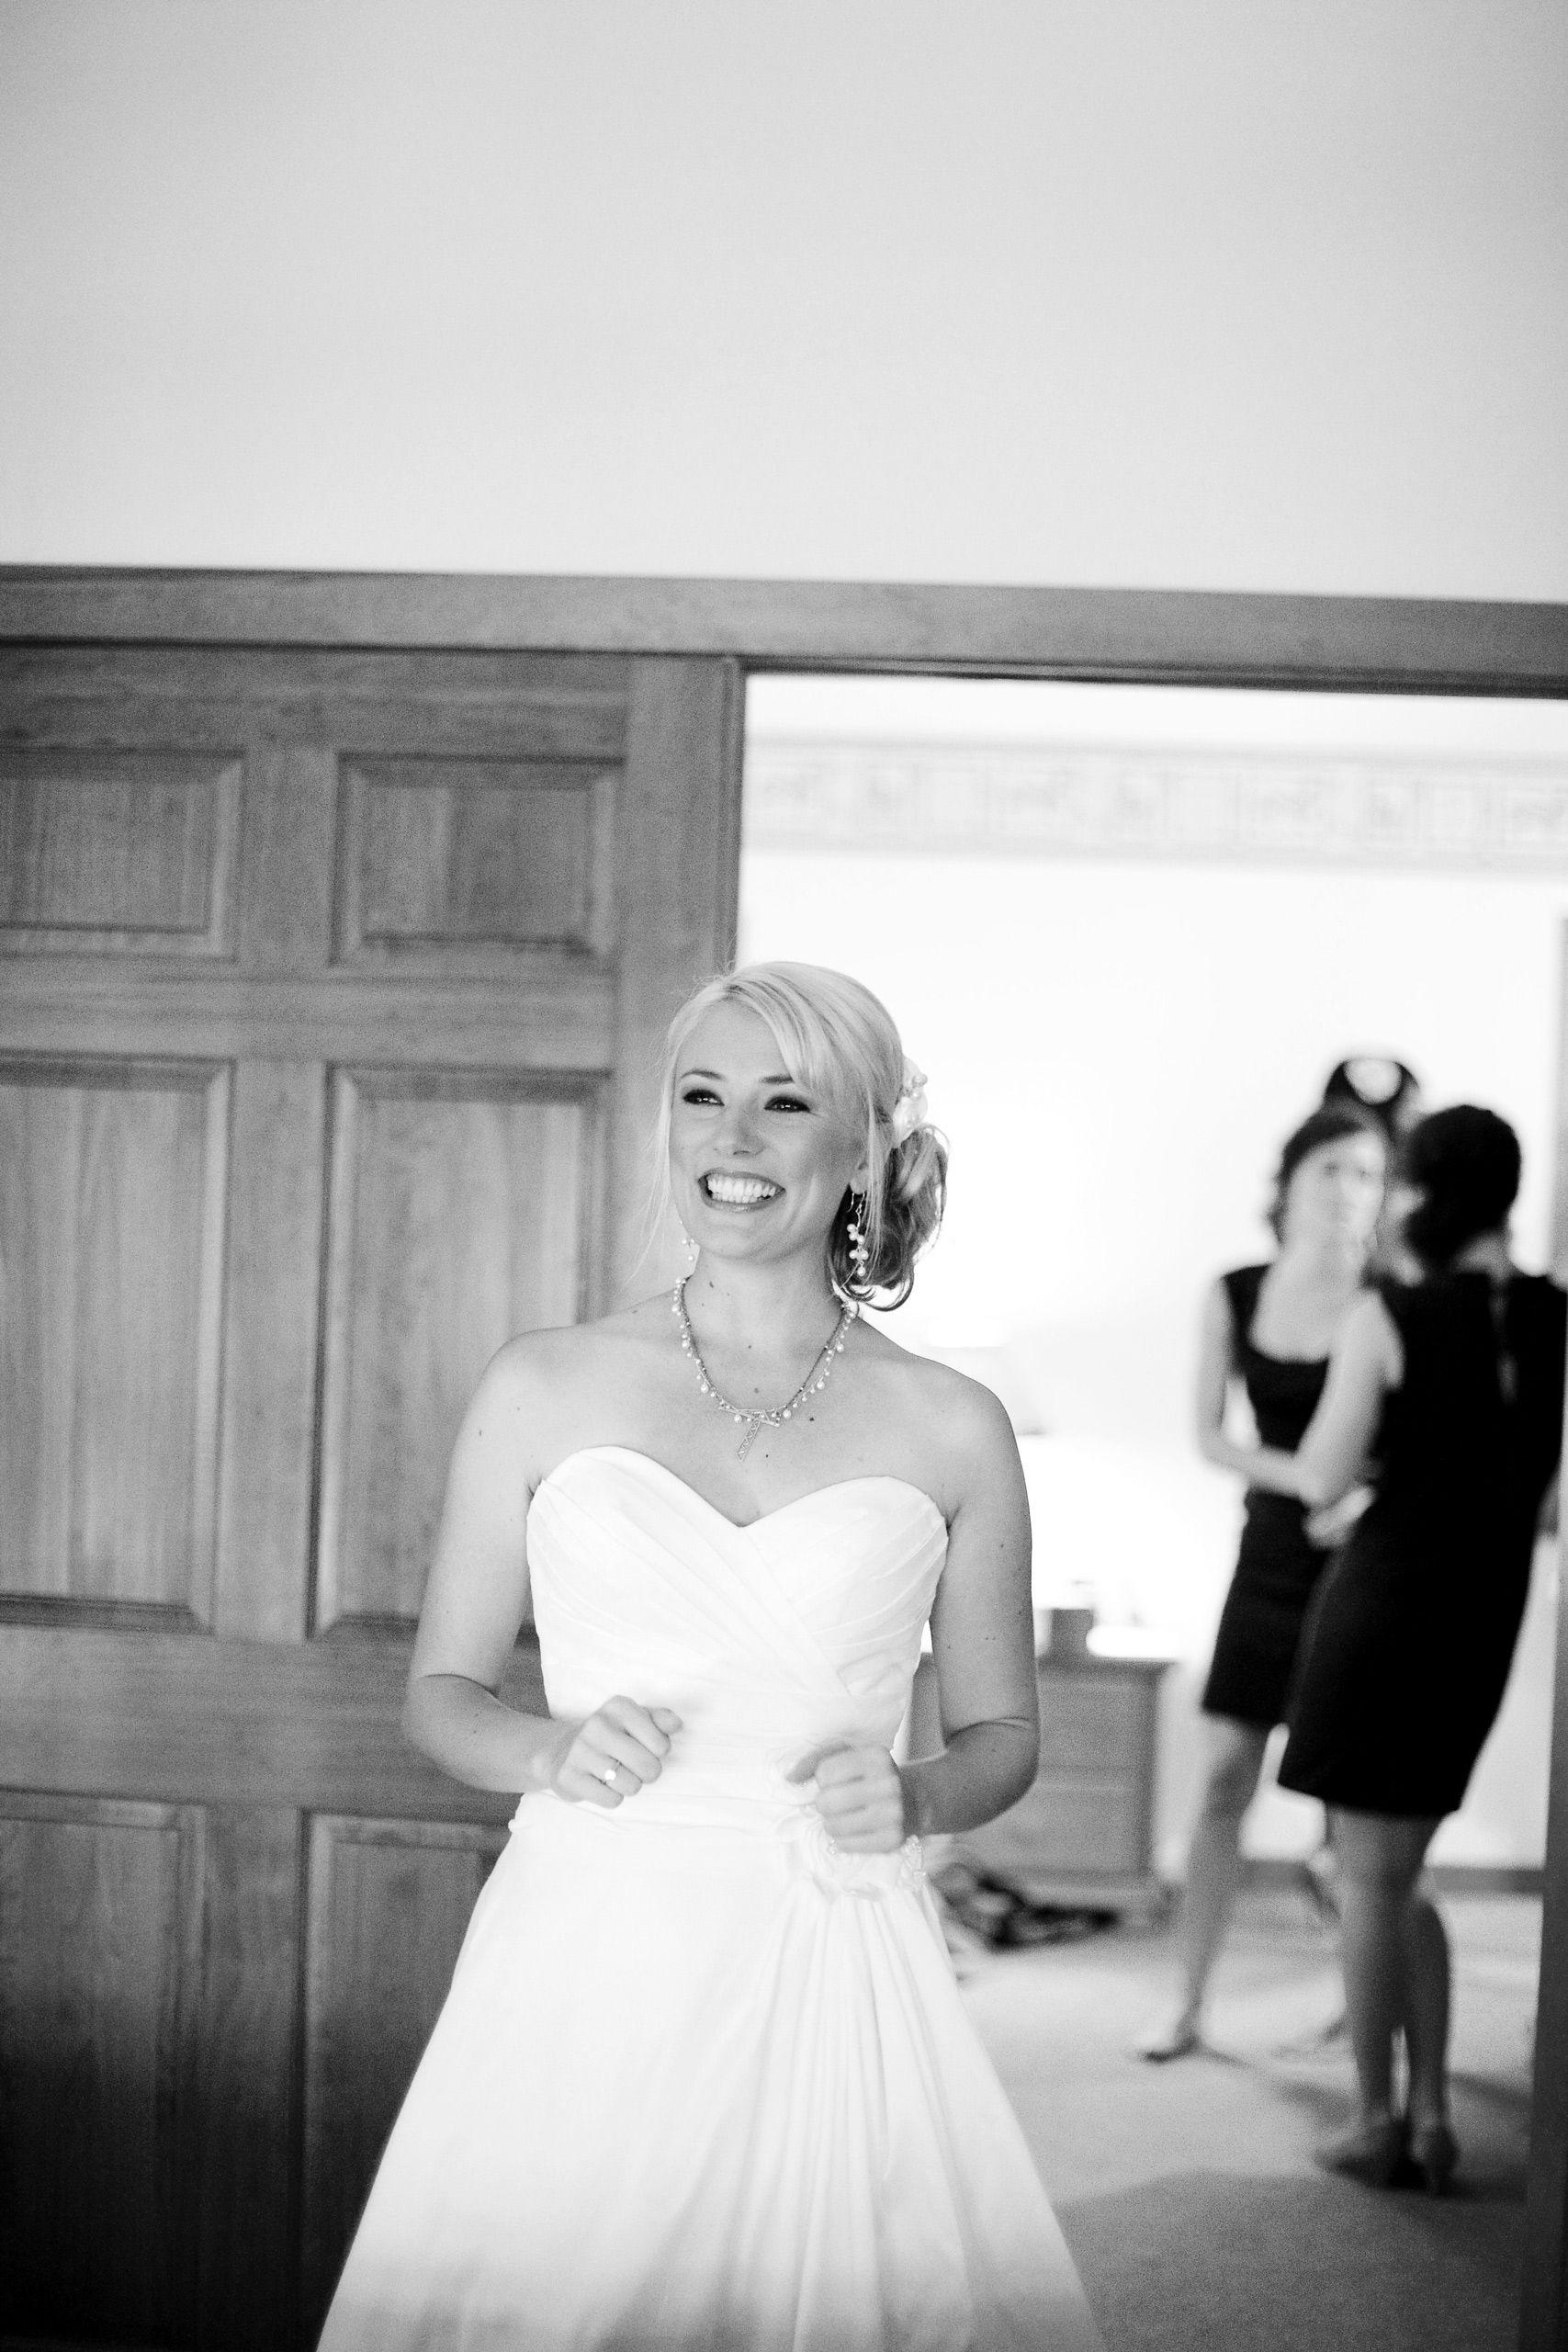 006b_Estes_Park_wedding.jpg